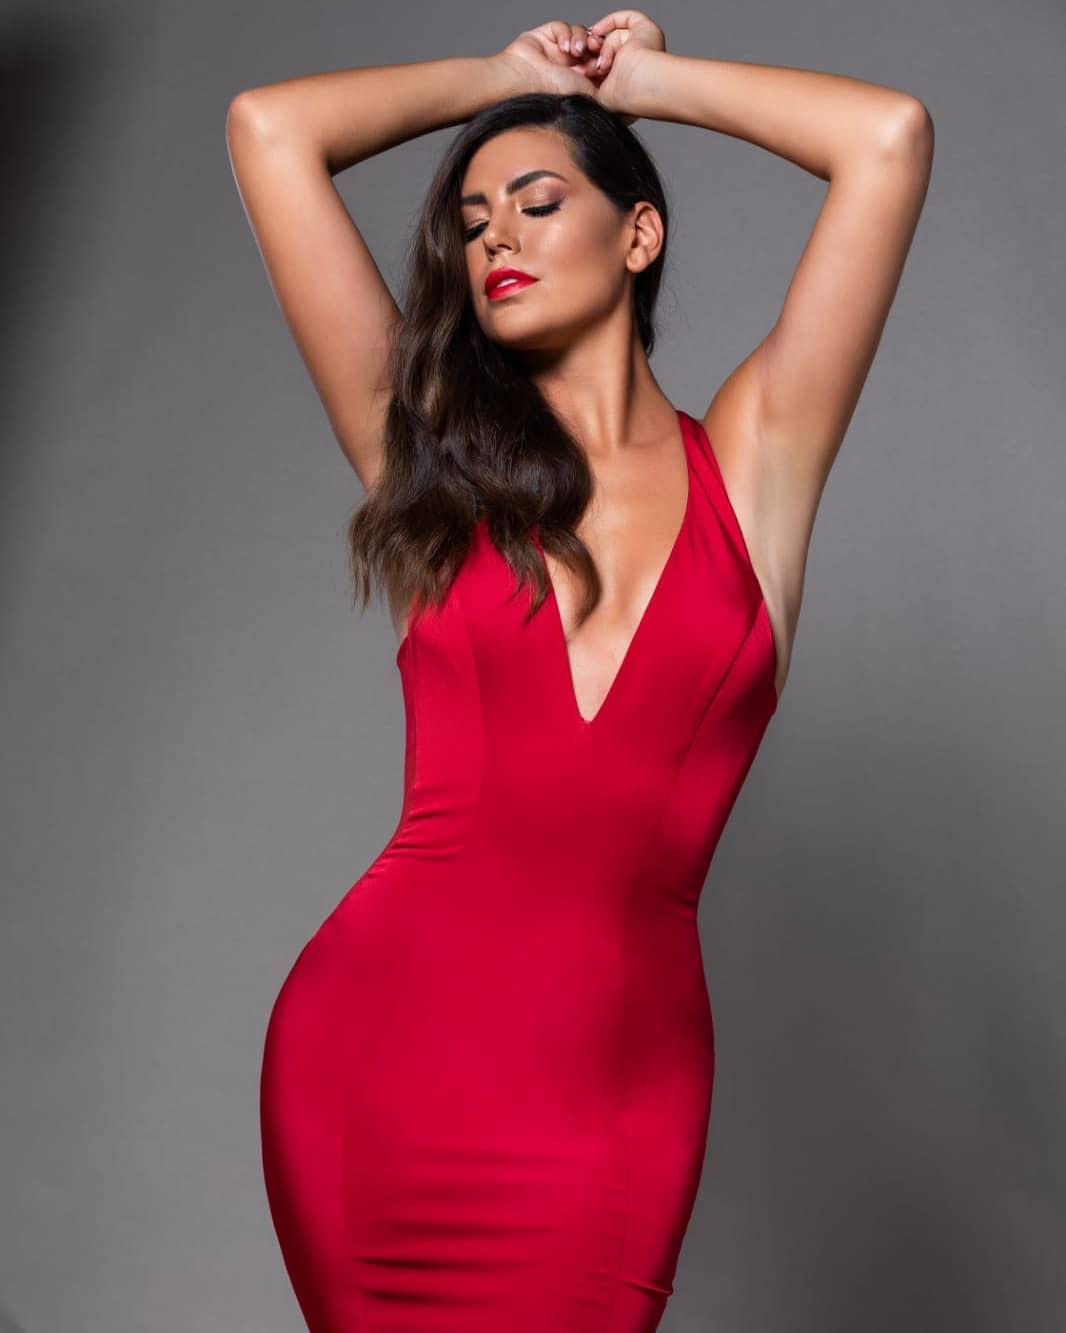 sofia del prado, top 10 de miss universe 2017/reyna hispanoamericana 2015/miss charm spain 2021. - Página 11 Sofiad17